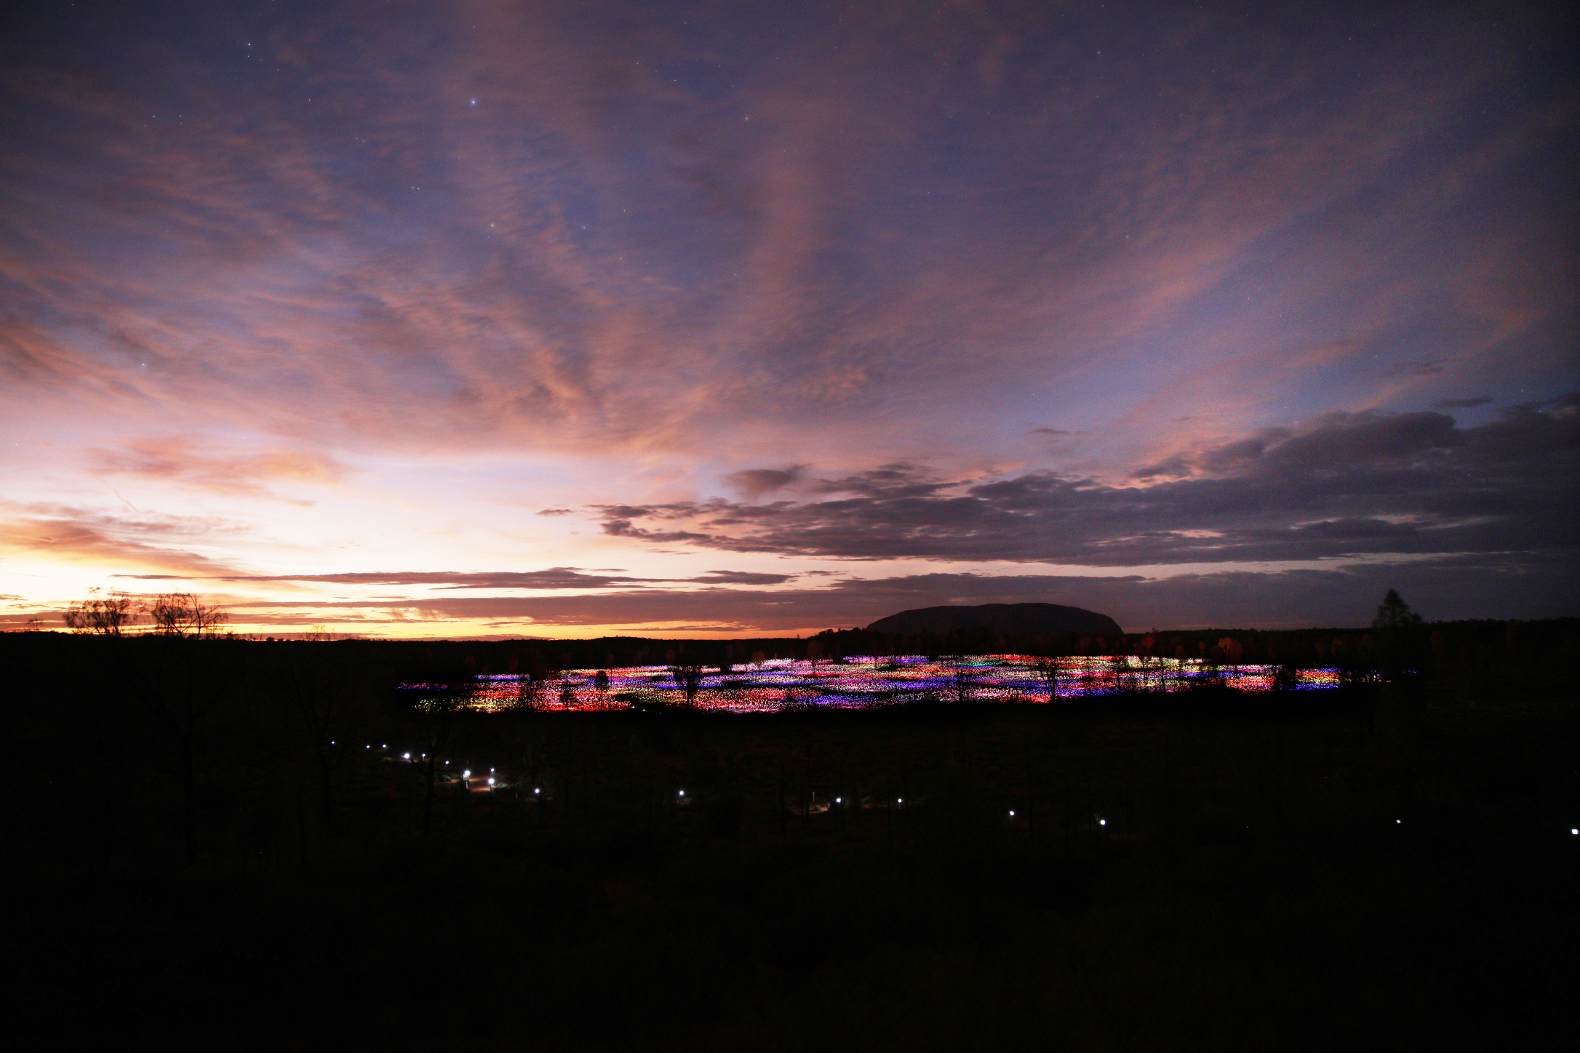 Bruce Munro, Field of Light, Uluru (aprile 2016 - marzo 2017)